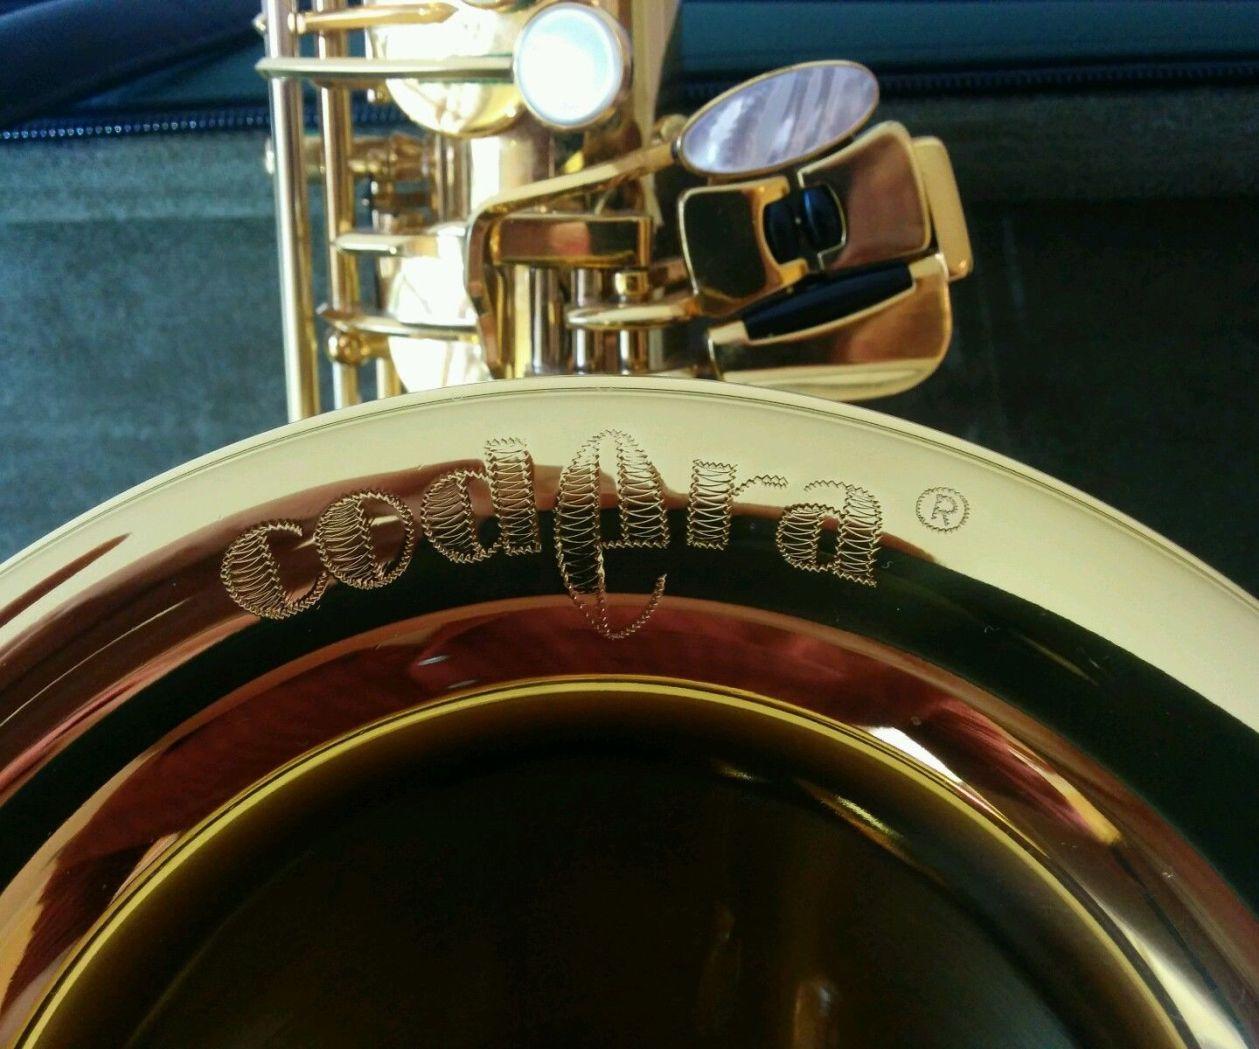 B&S Codera saxophone, Codera bell engraving, sax keys, German saxophone